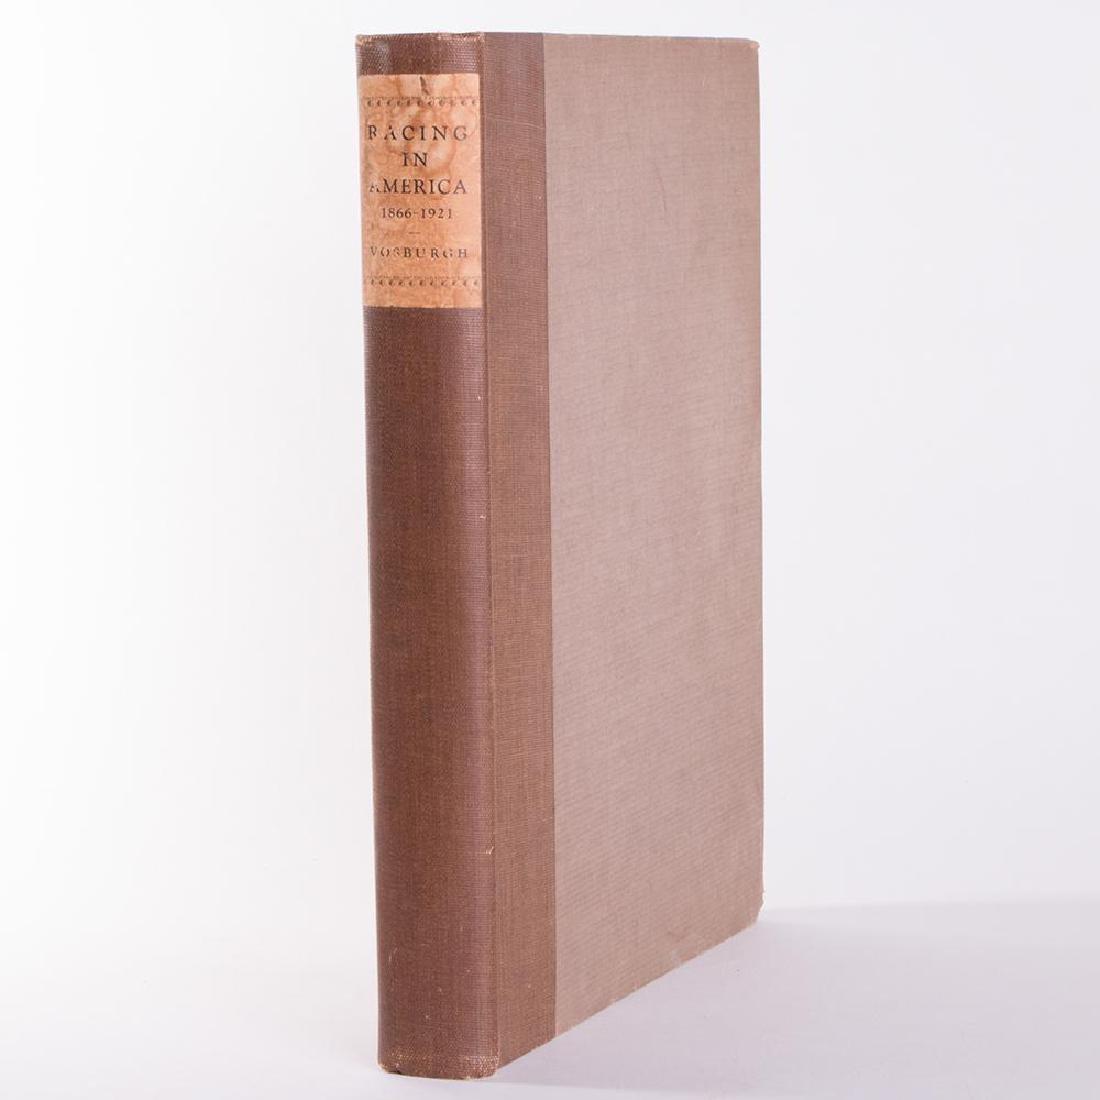 W.S. Vosburgh, Racing in America, 1866-1921